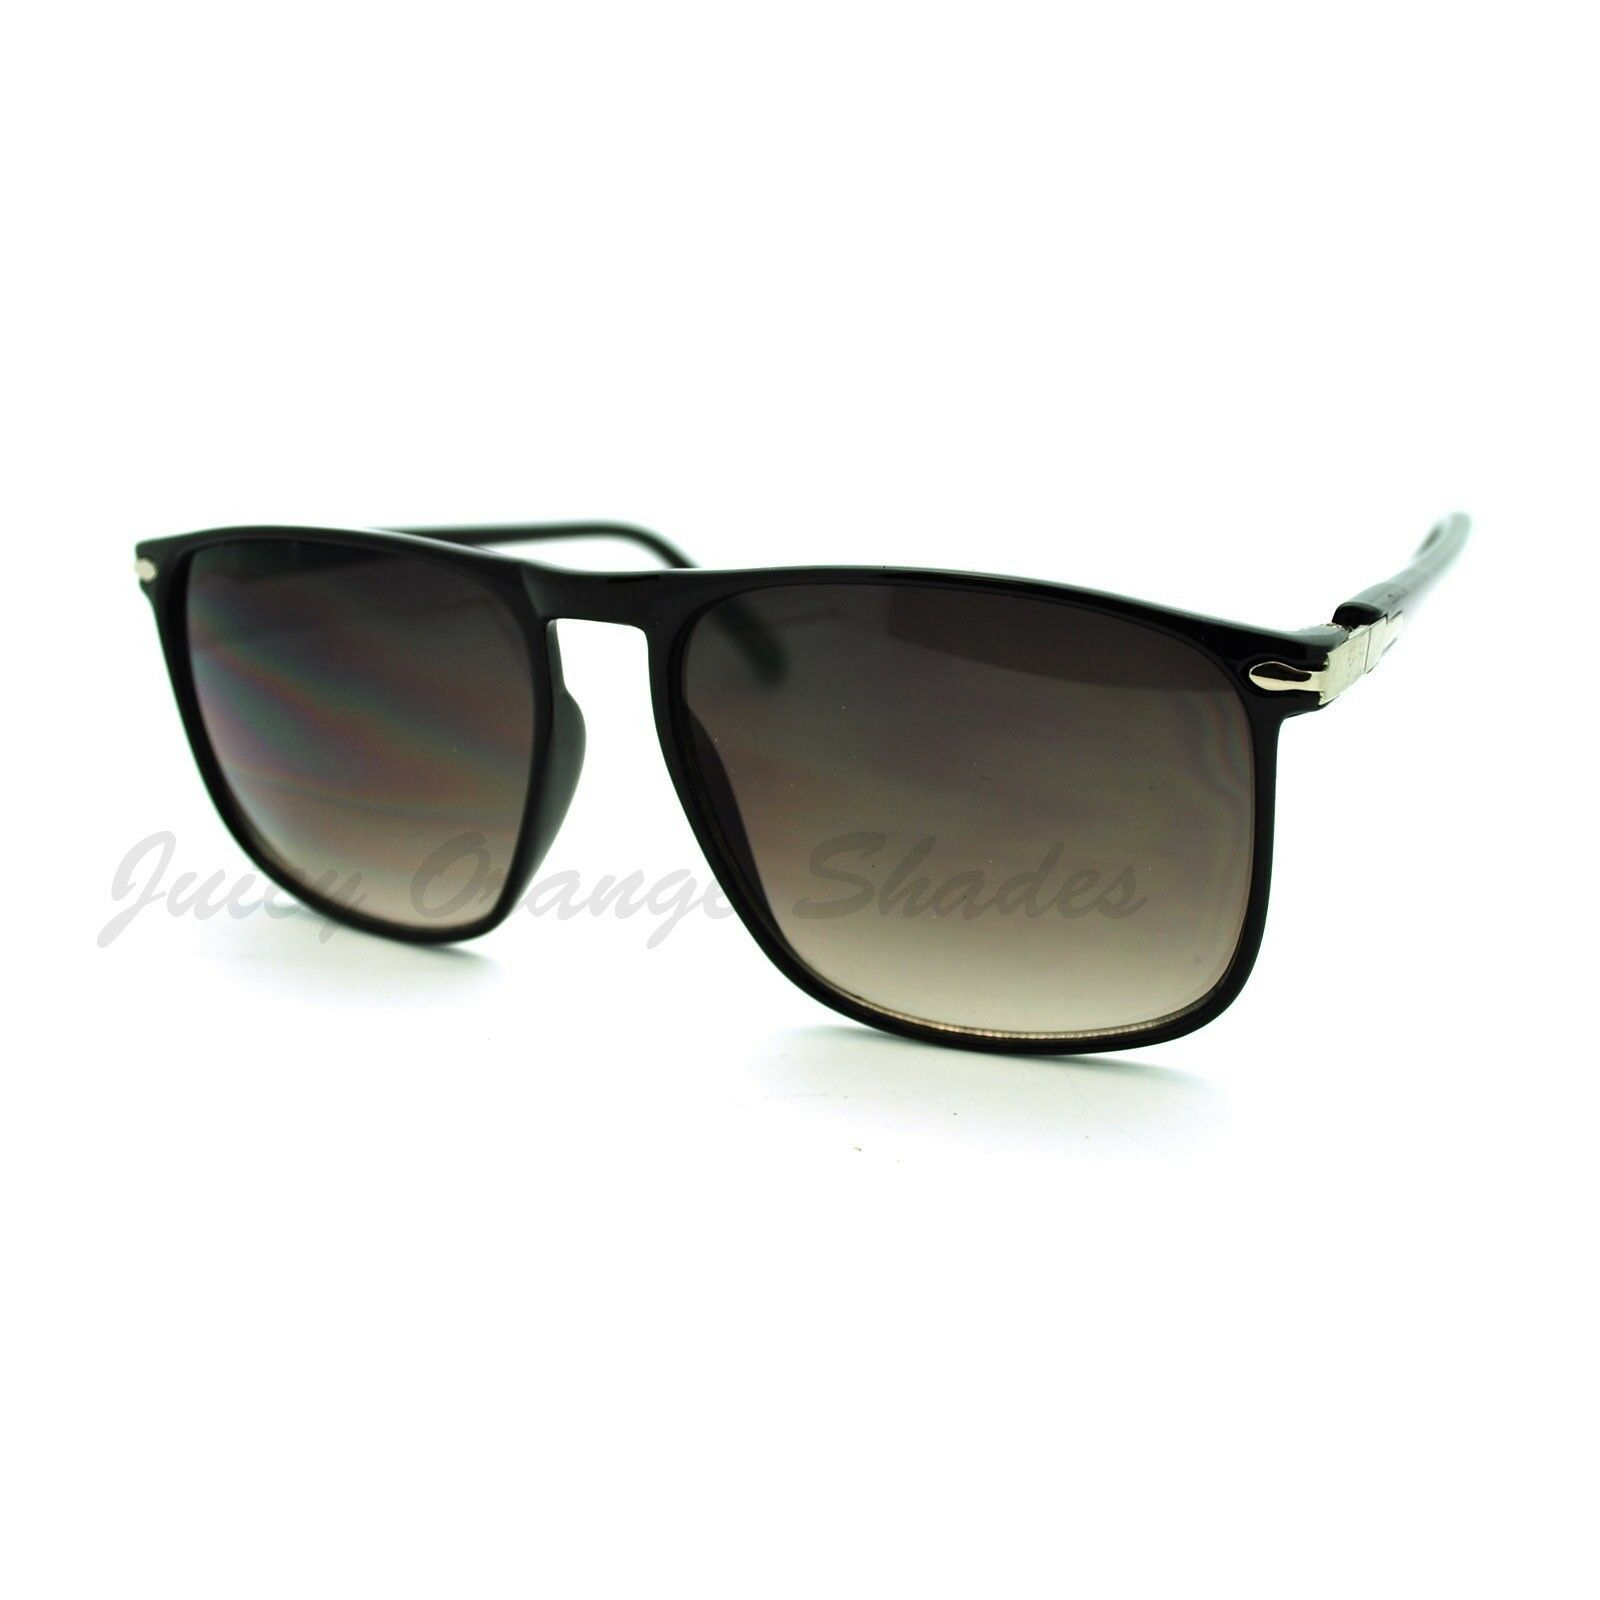 Thin Square Sunglasses Unisex Retro Designer Fashion Shades